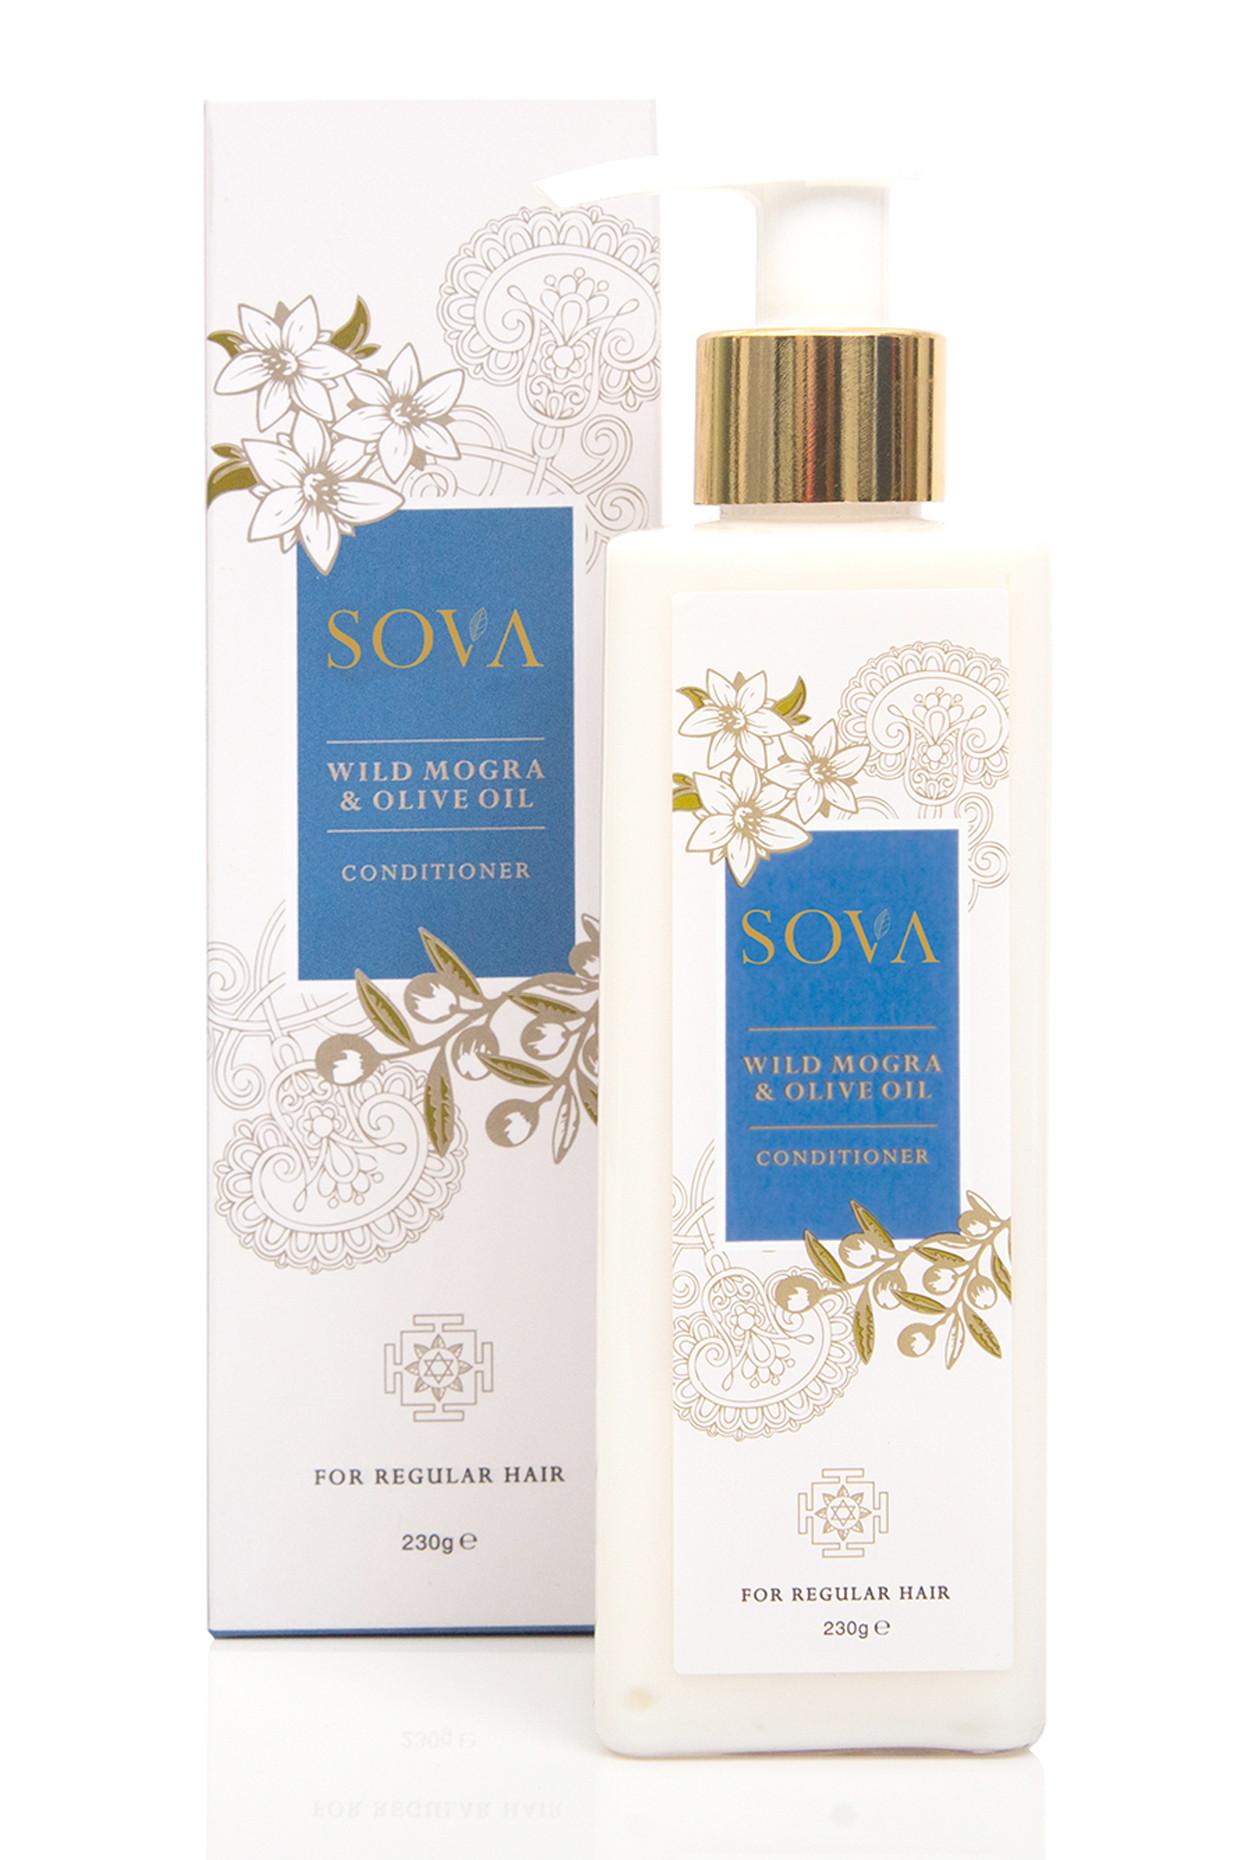 Olive Oil & Wild Mogra Conditioner For Regular Hair by SOVA